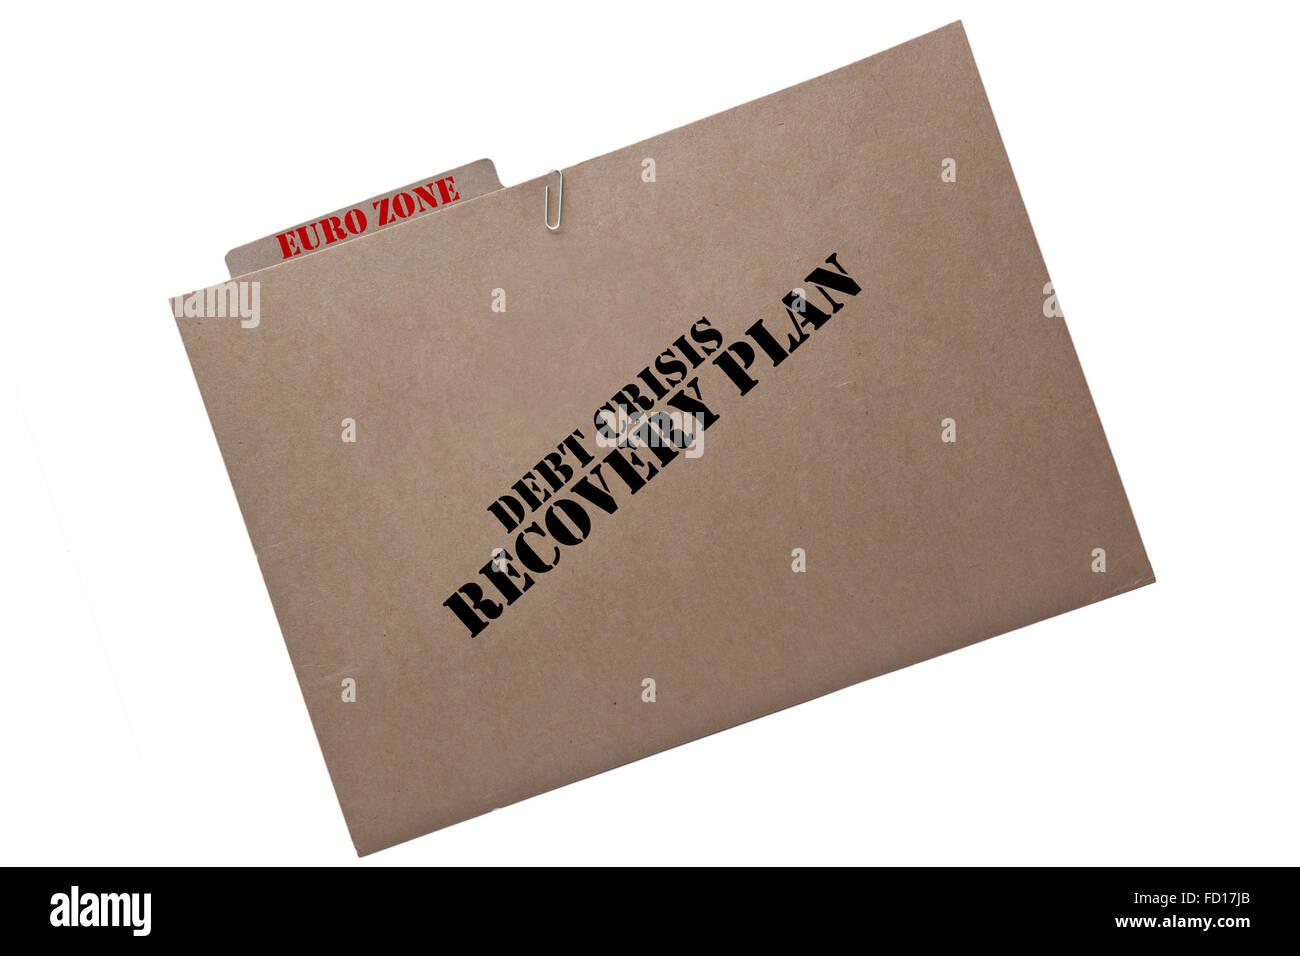 European financial crisis  recovery plan - Stock Image